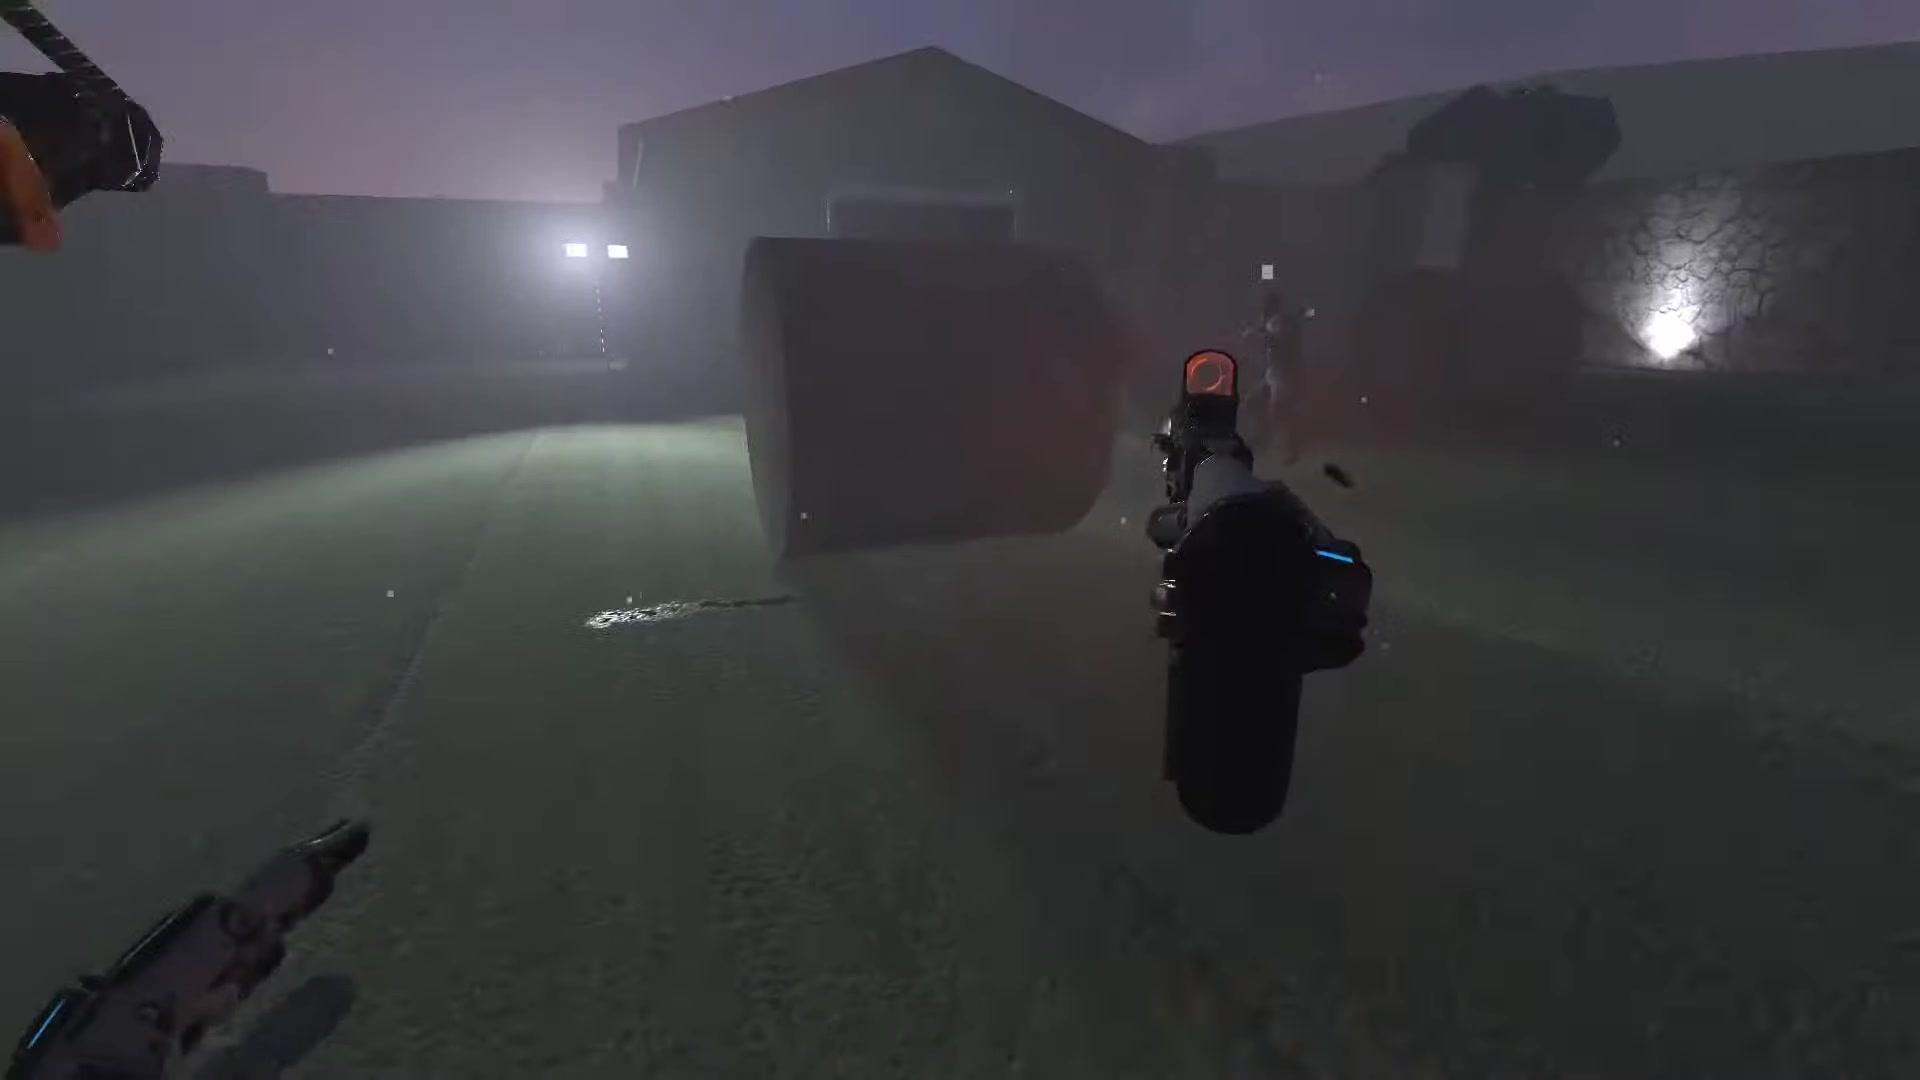 【PlayScope预告片】潜行FPS游戏《Espire 1: VR Operative》游戏预告